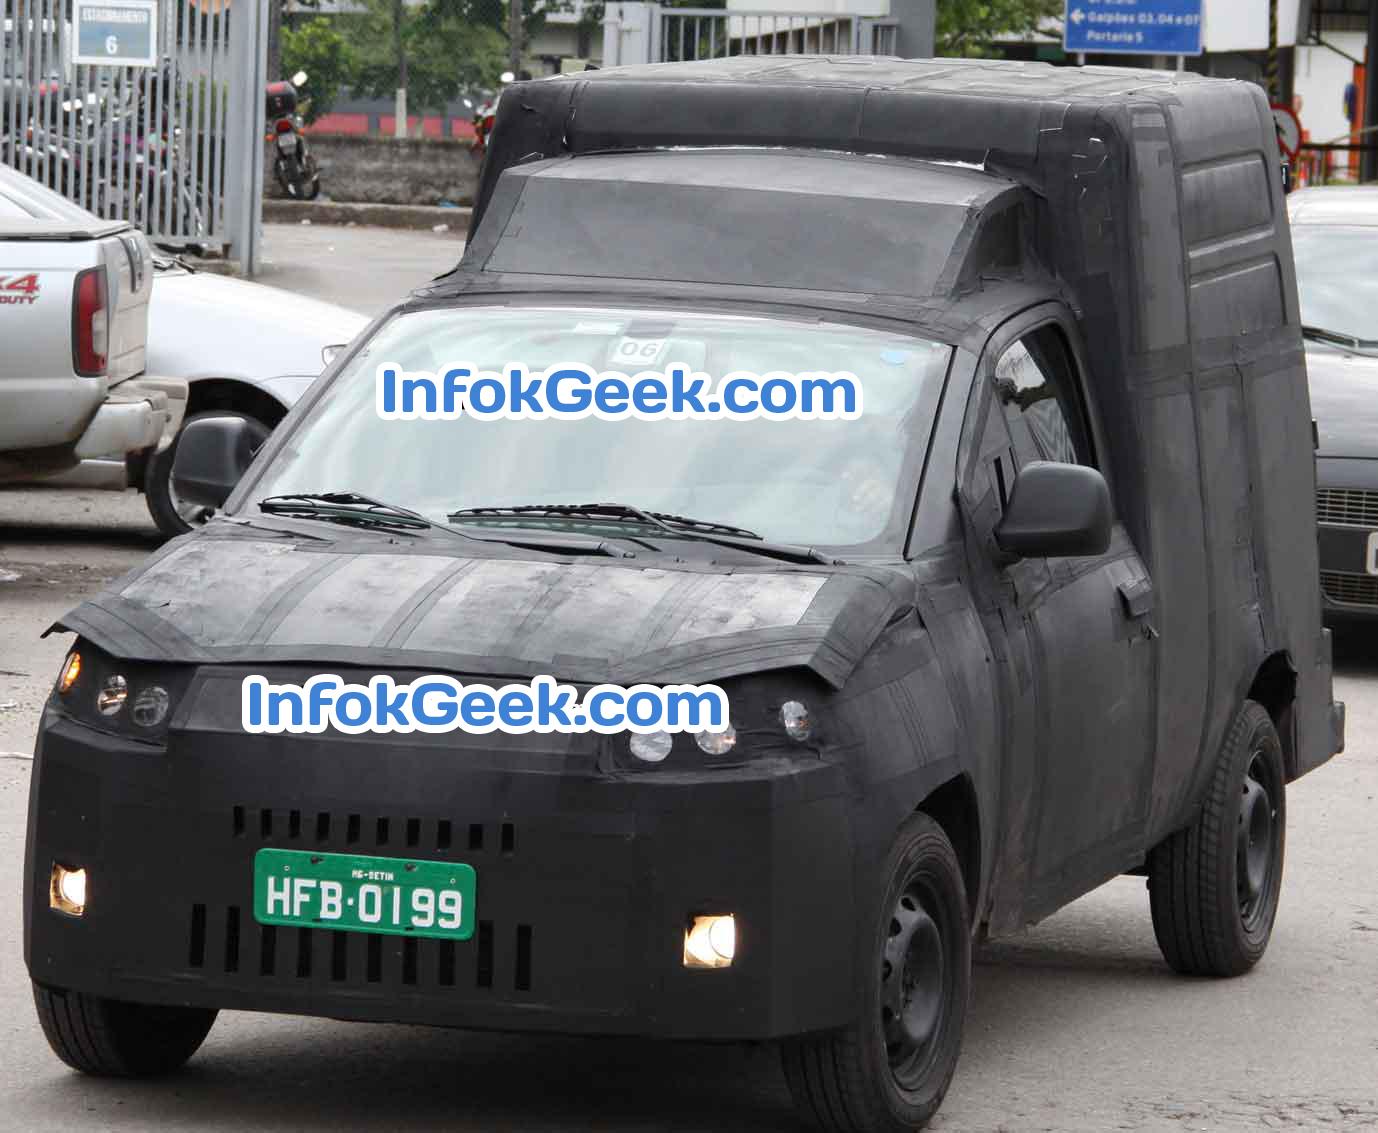 Nueva Fiat Fiorino 2014 haciendo pruebas en Brasil